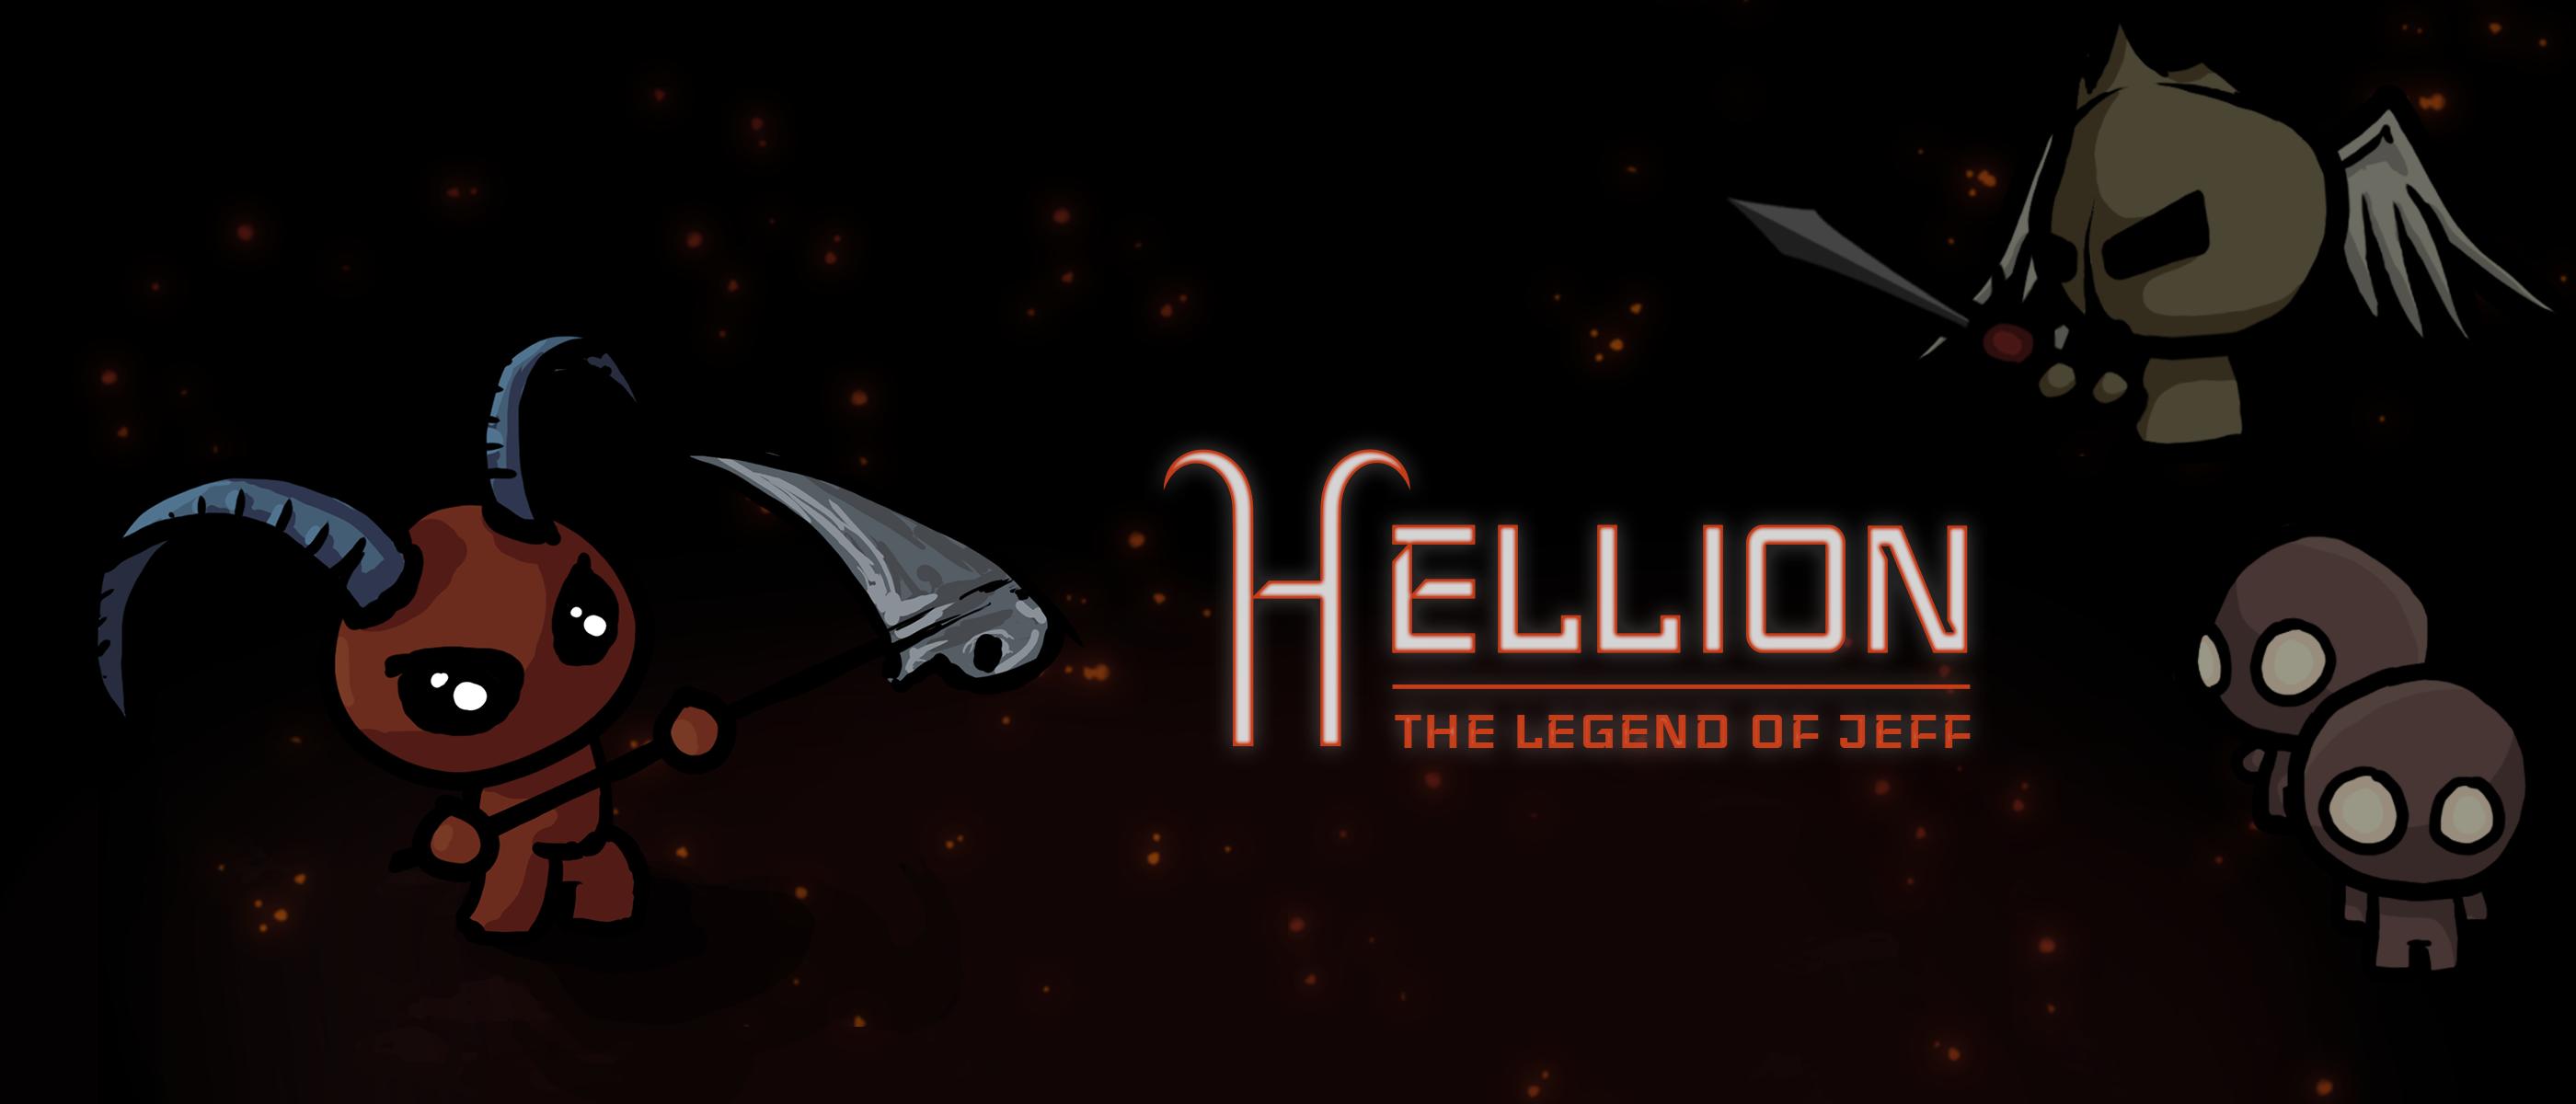 Hellion: The Legend of Jeff